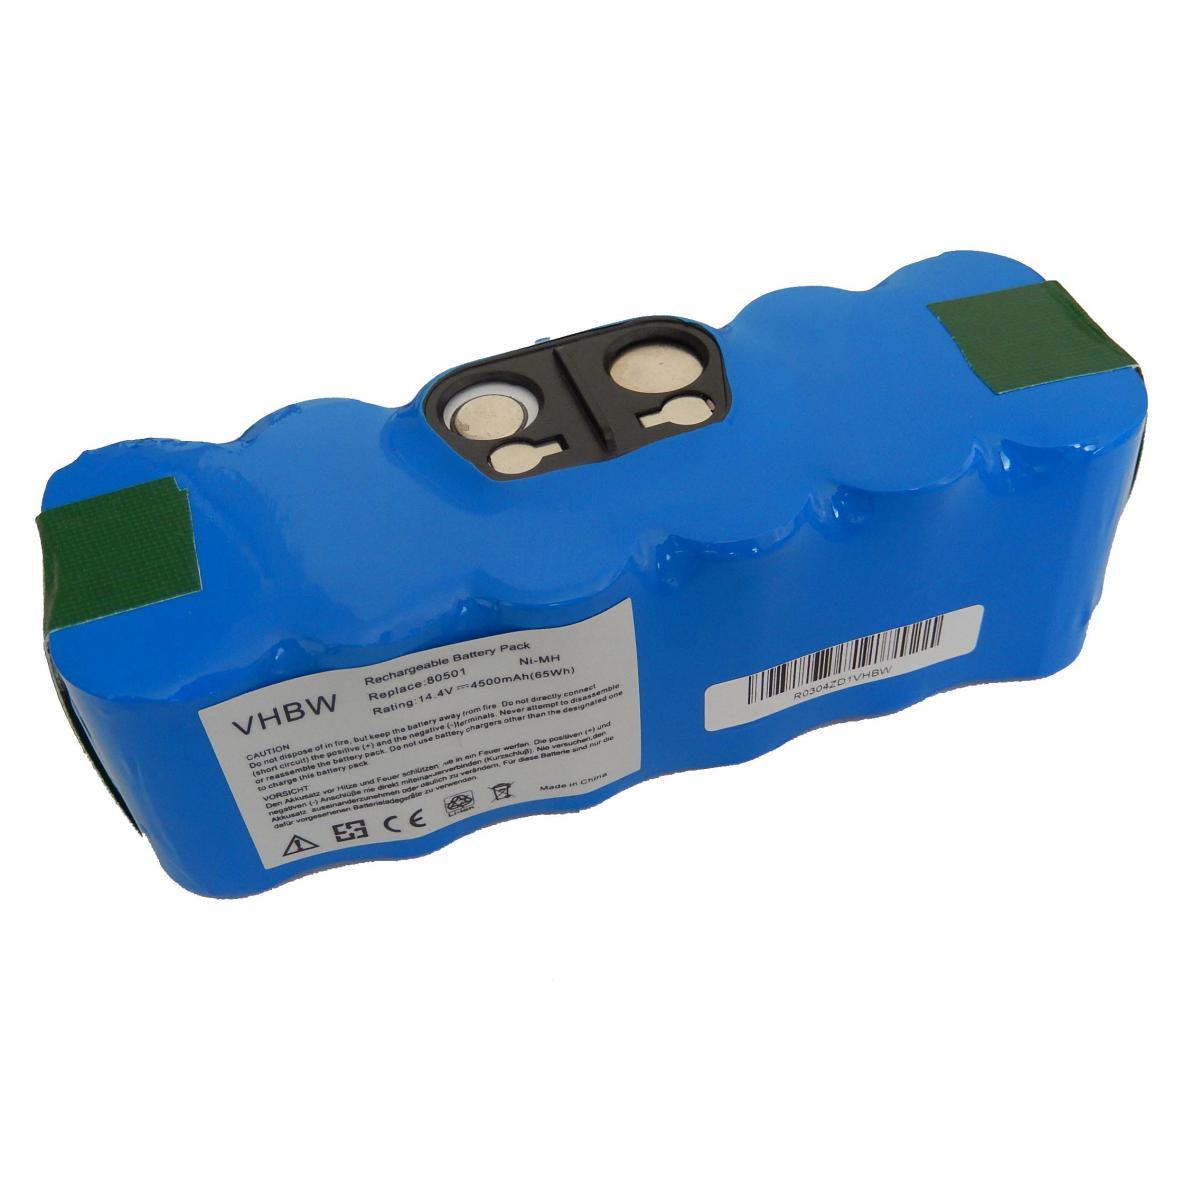 Vhbw vhbw batterie Ni-MH 4500mAh (14.4V) compatible avec iRobot Roomba 700, 785, 790 aspirateur remplace 11702, GD-Roomba-500